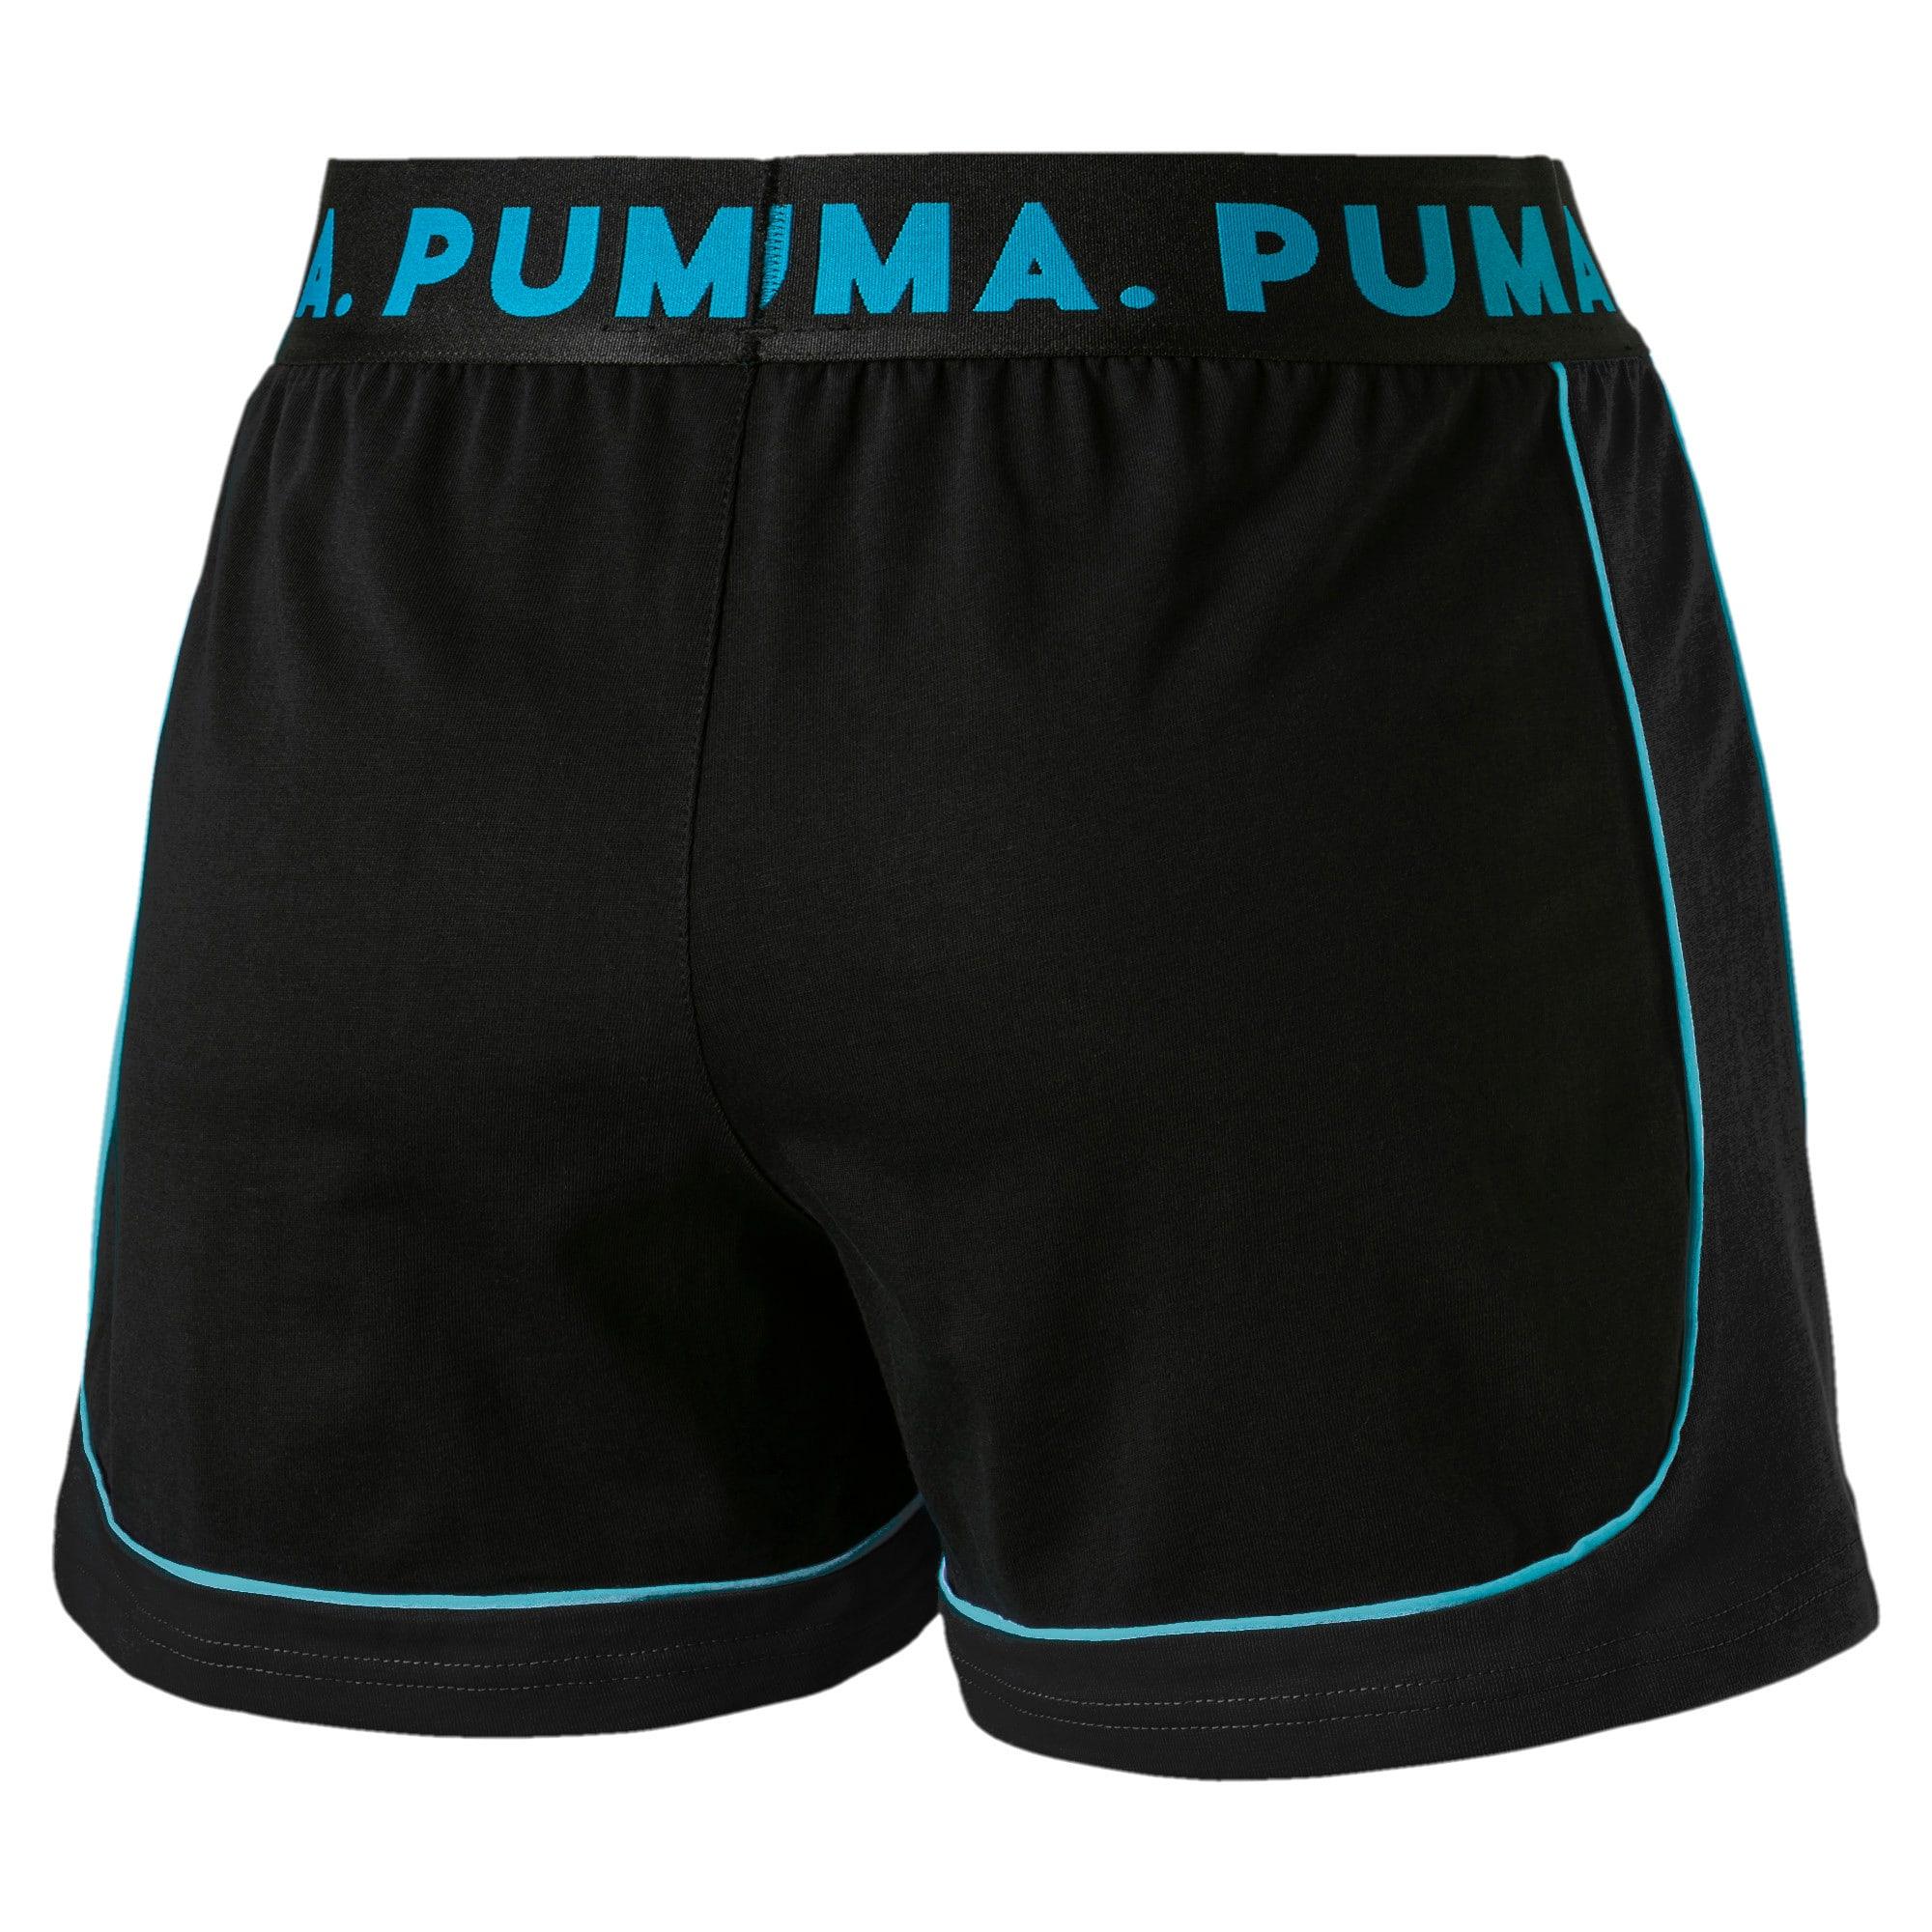 Thumbnail 5 of Chase Women's Shorts, Cotton Black-Caribbean Sea, medium